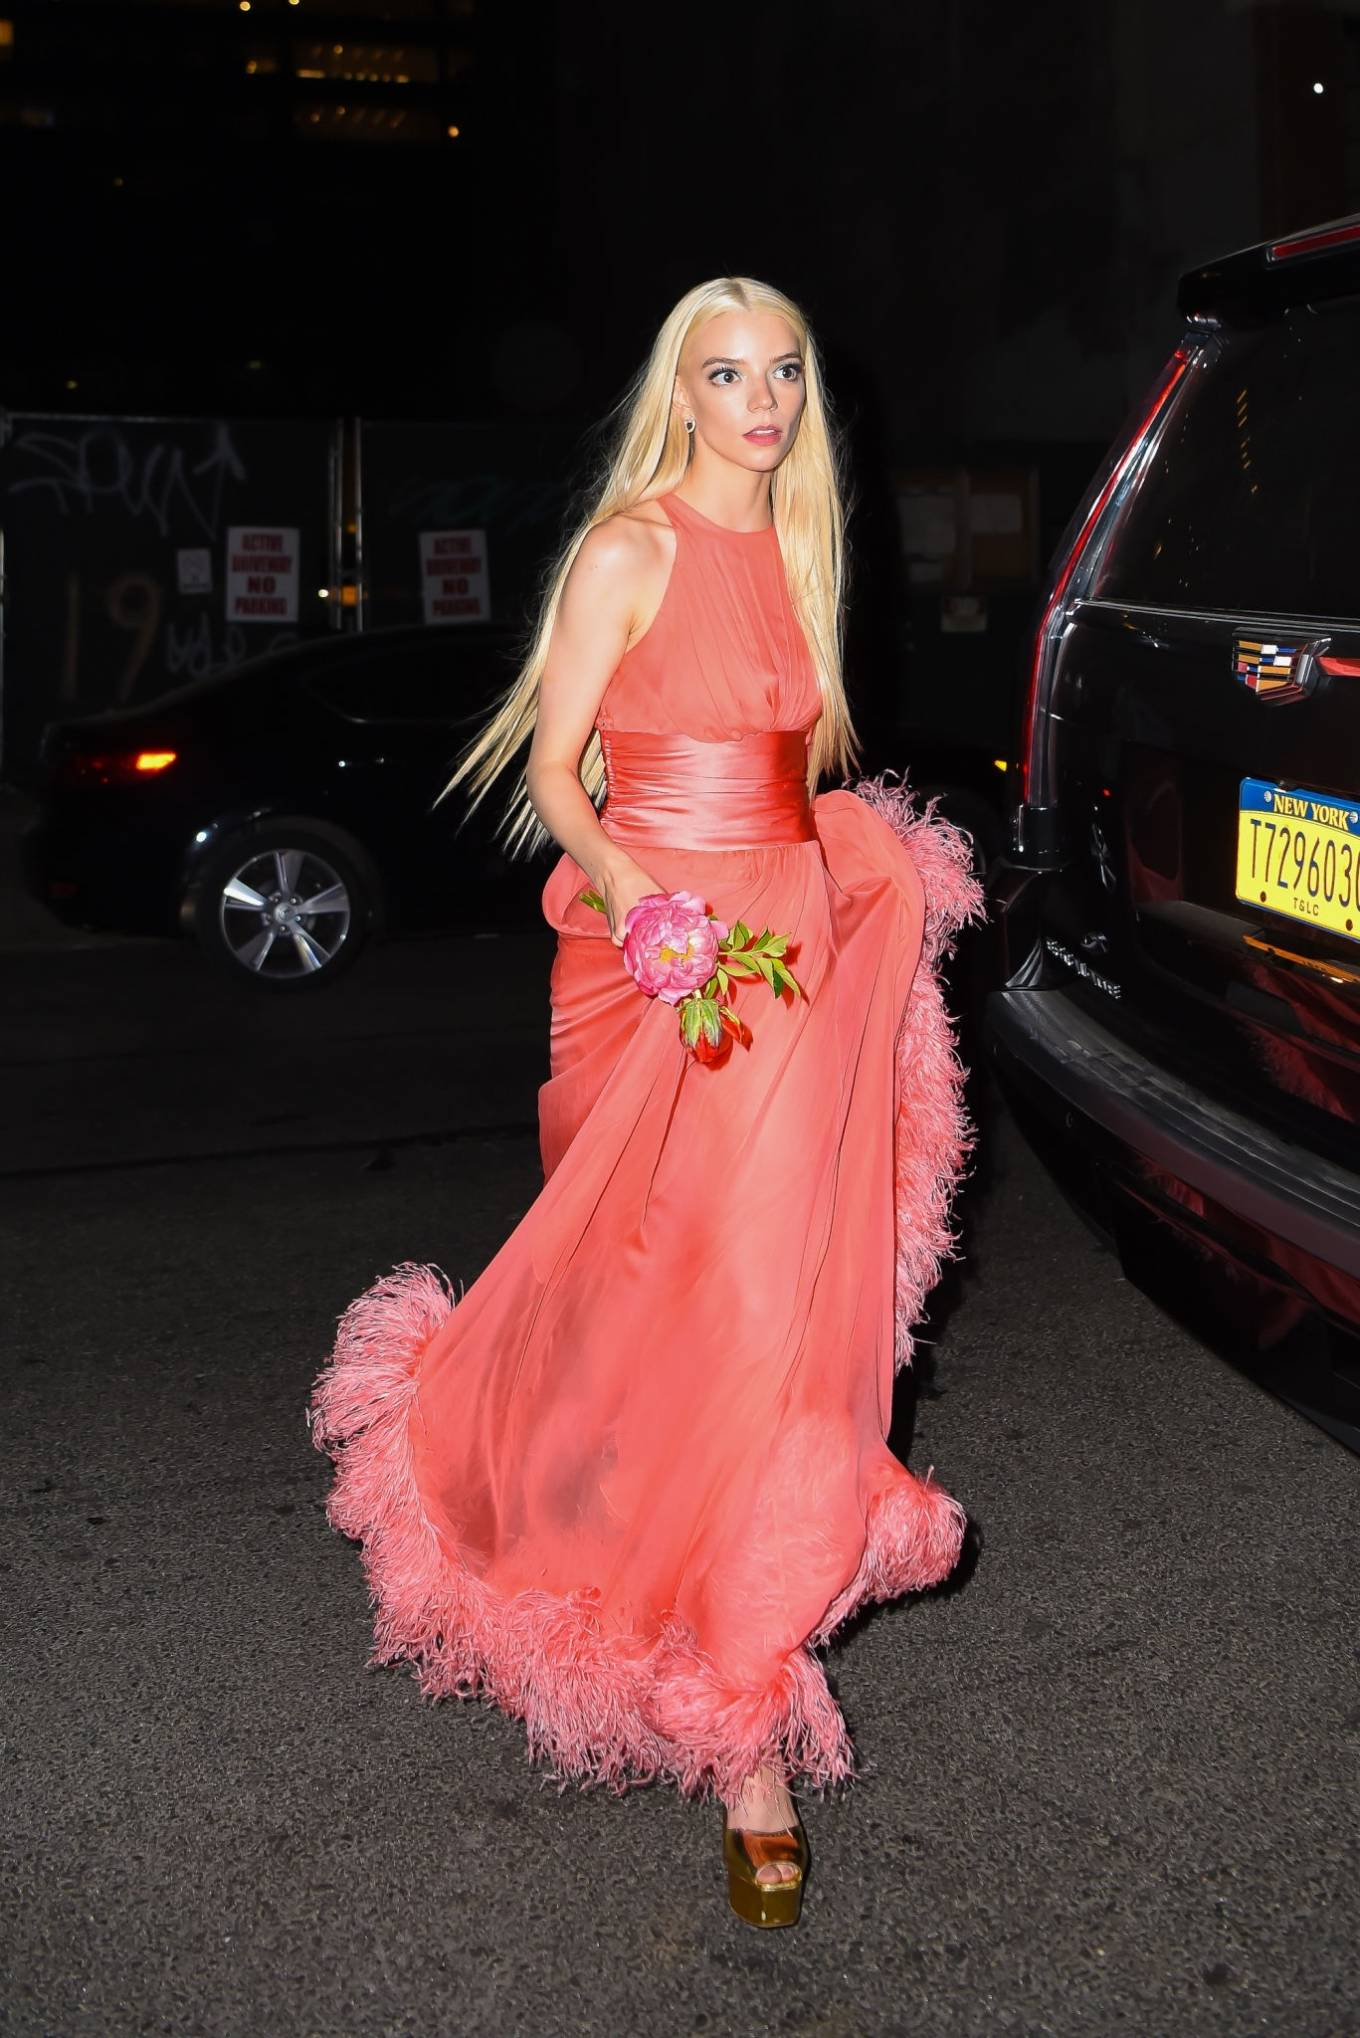 Anya Taylor-Joy - In orange dress leaving the Rockefeller Center after hosting SNL in New York